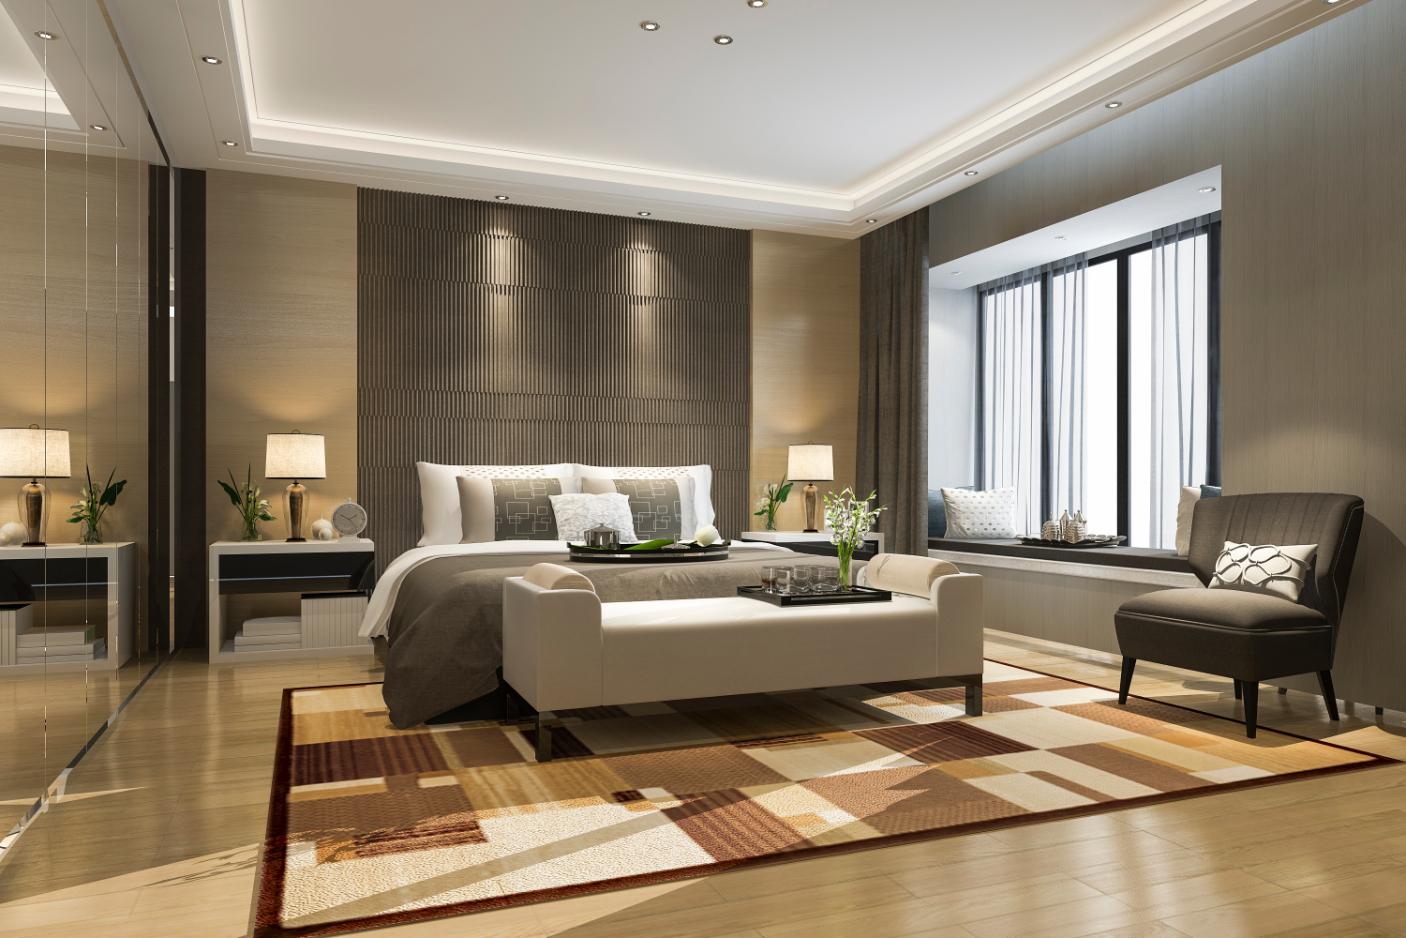 3d rendering beautiful luxury bedroom suite hotel with mirror wardrobe 1